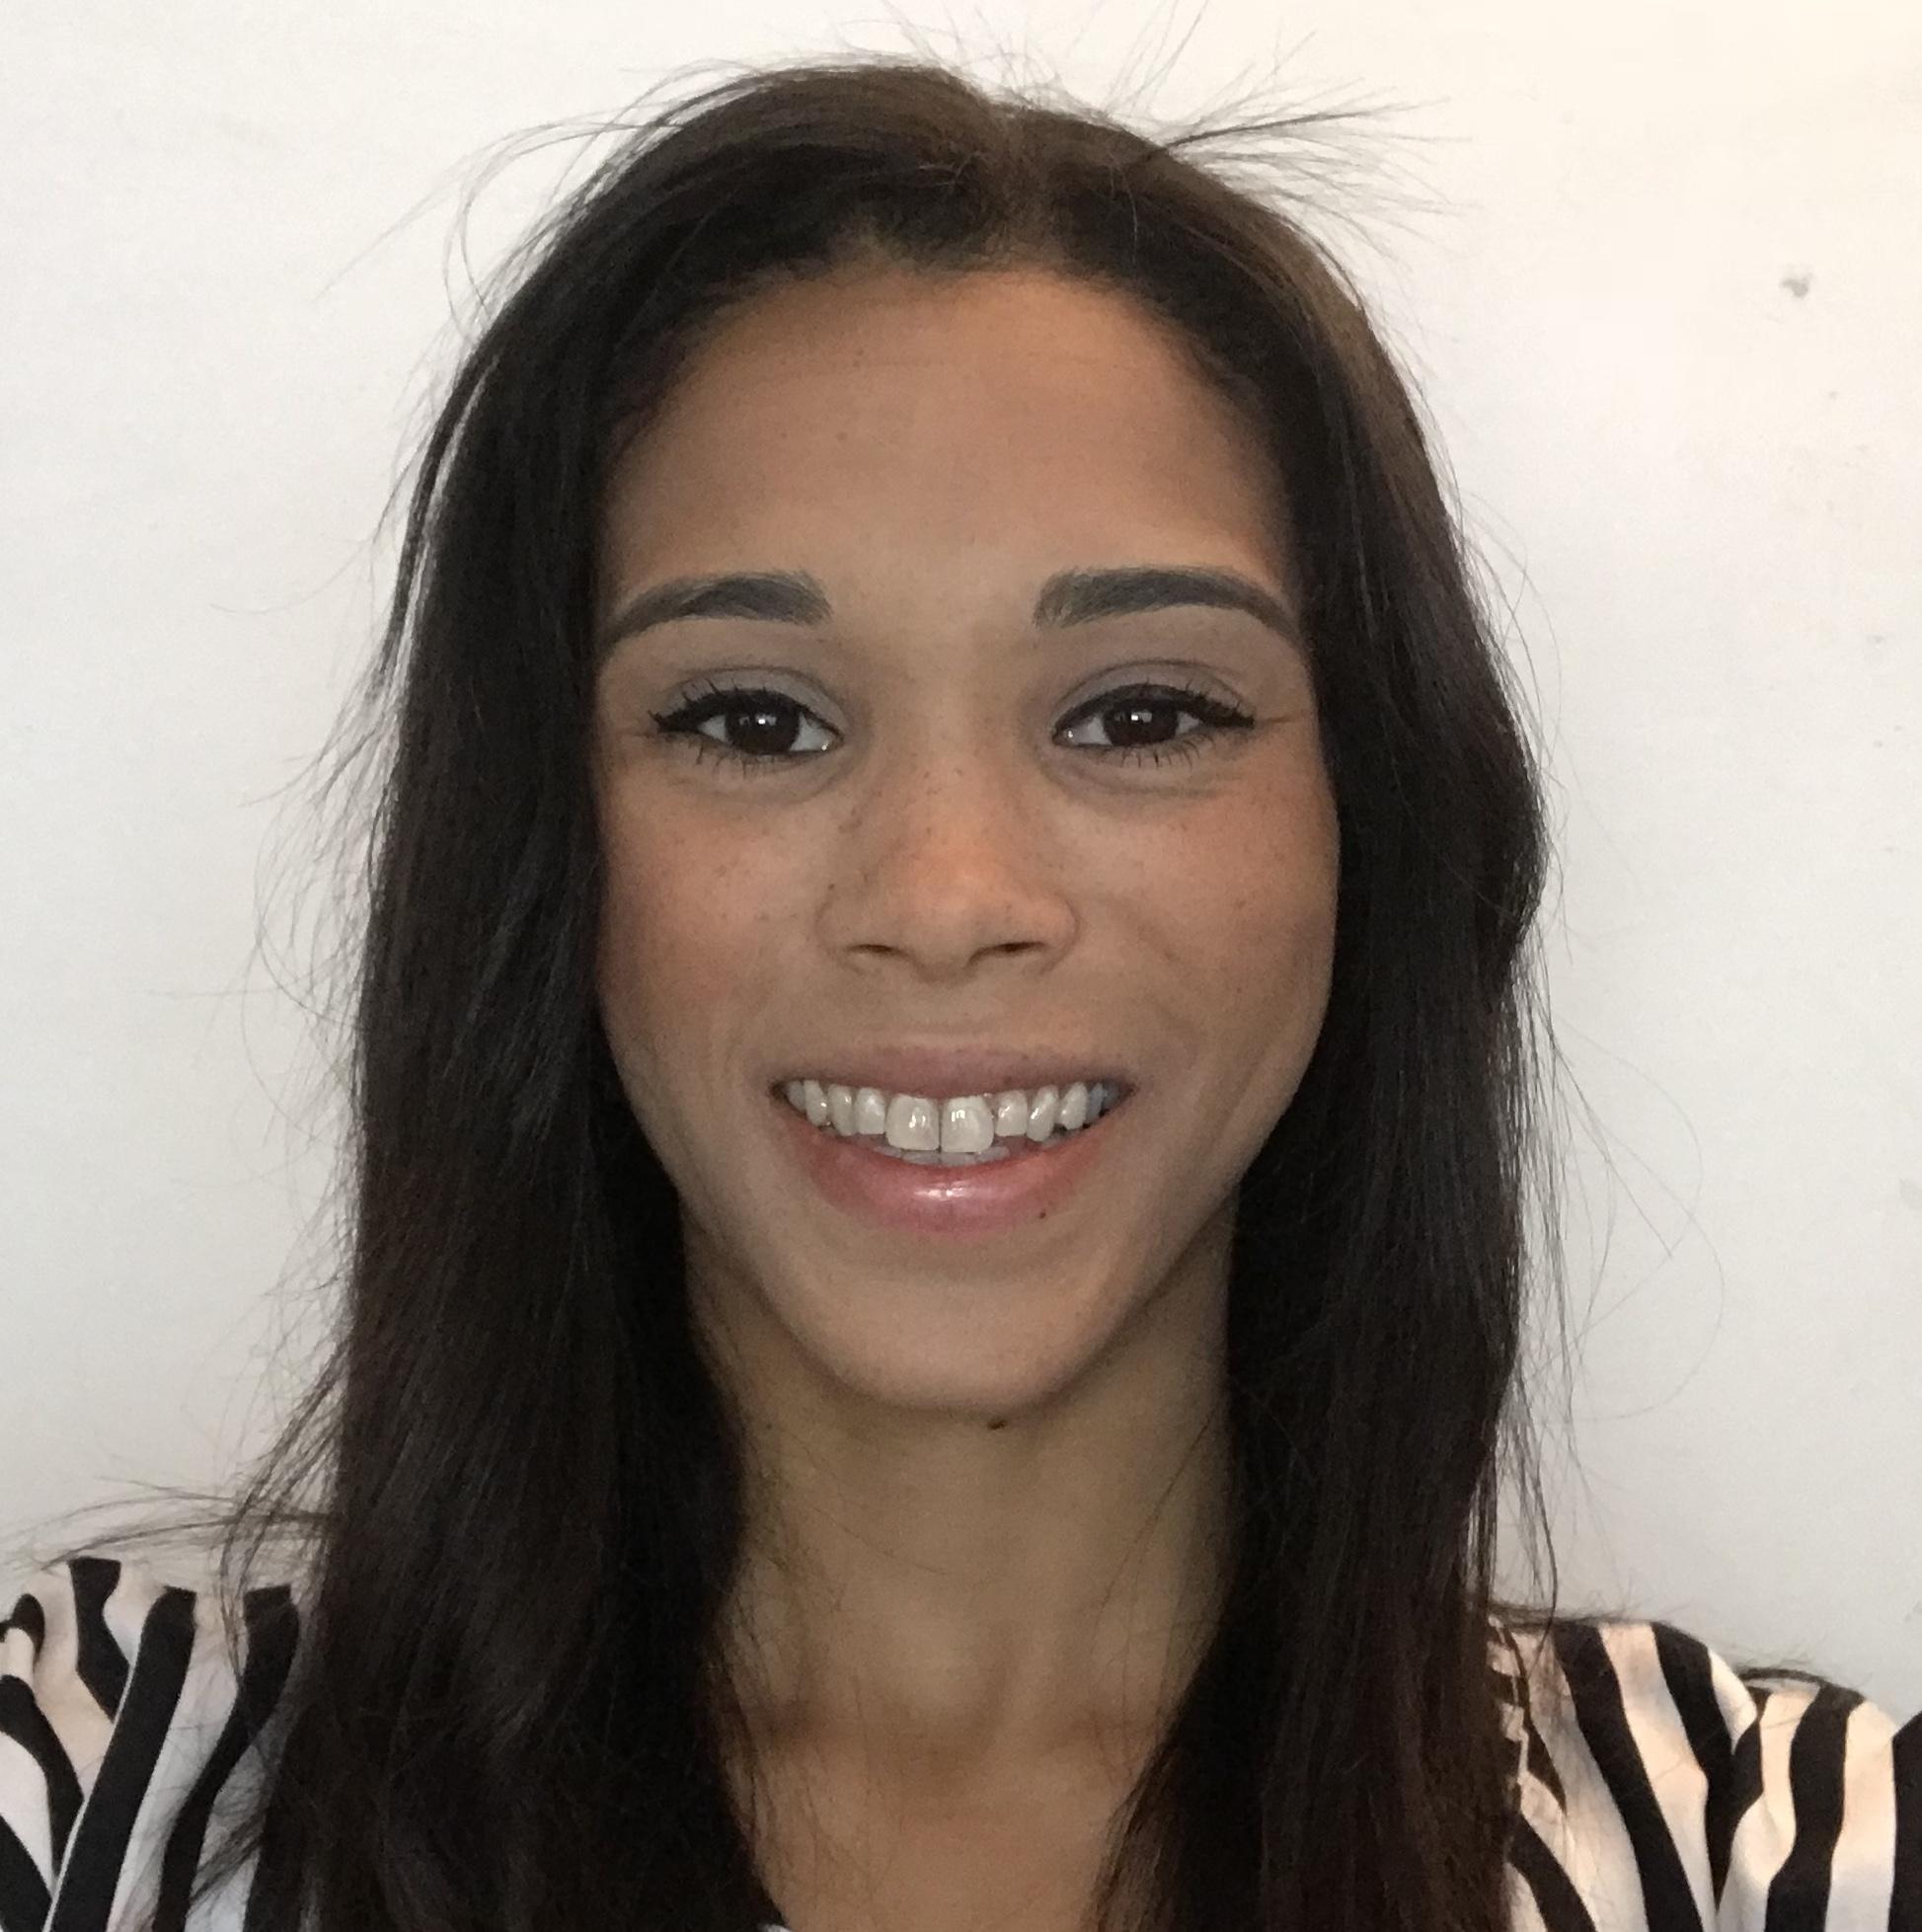 Joanna photo